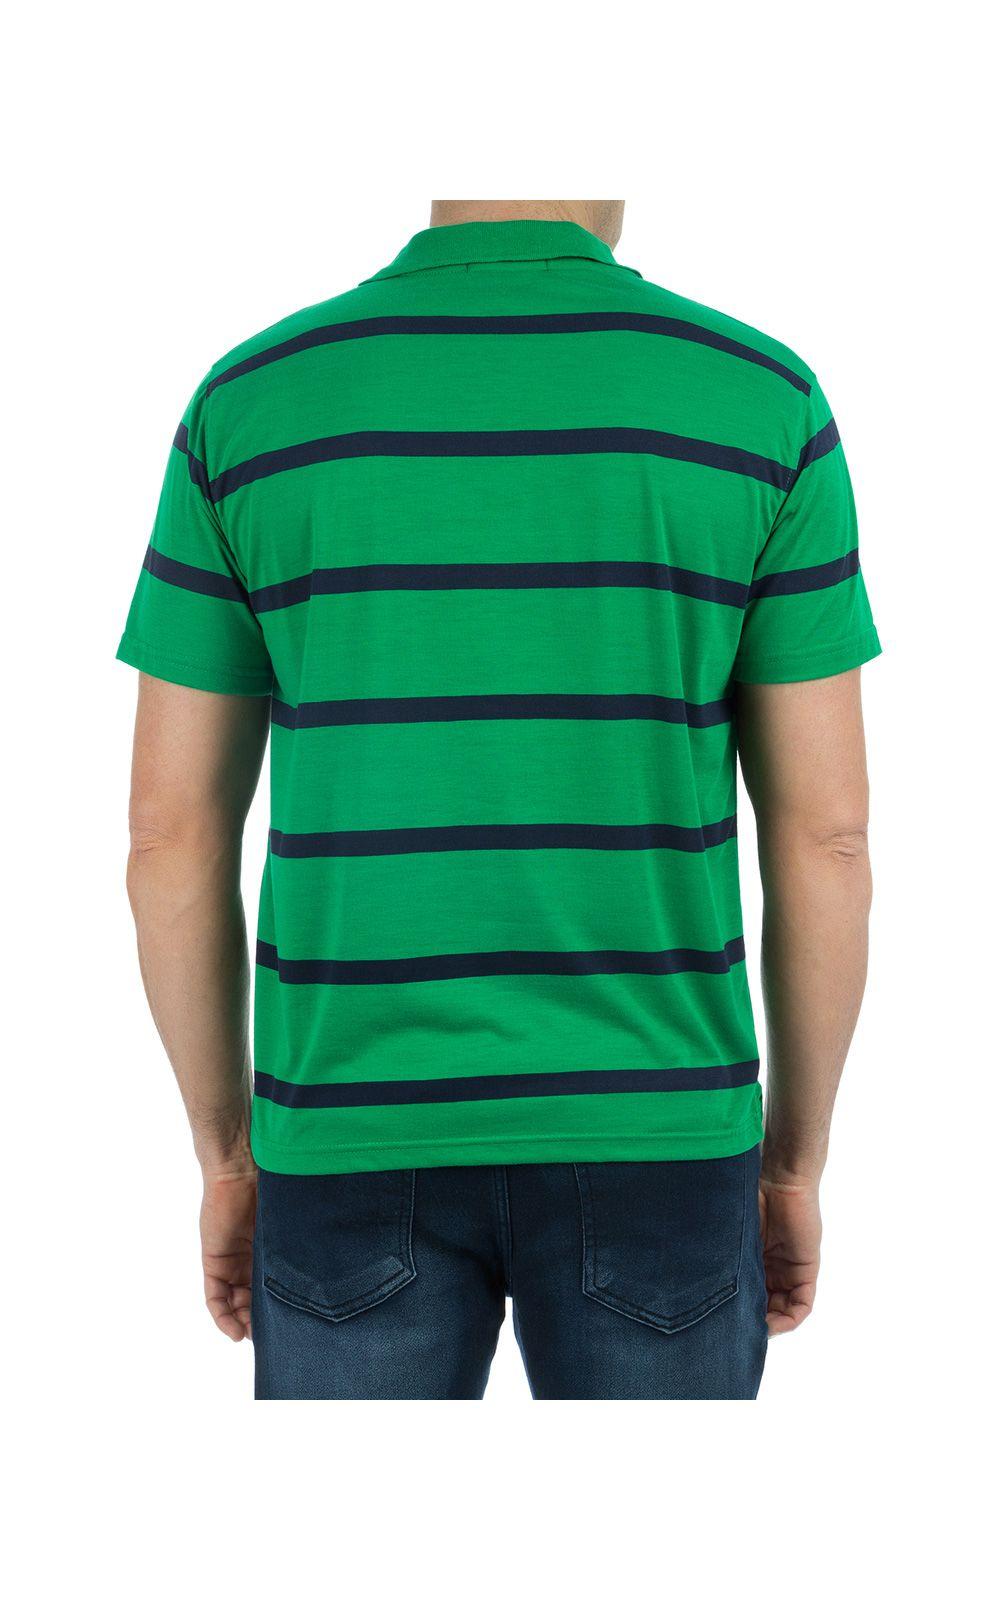 Foto 2 - Camisa Polo Masculina Verde Listrada